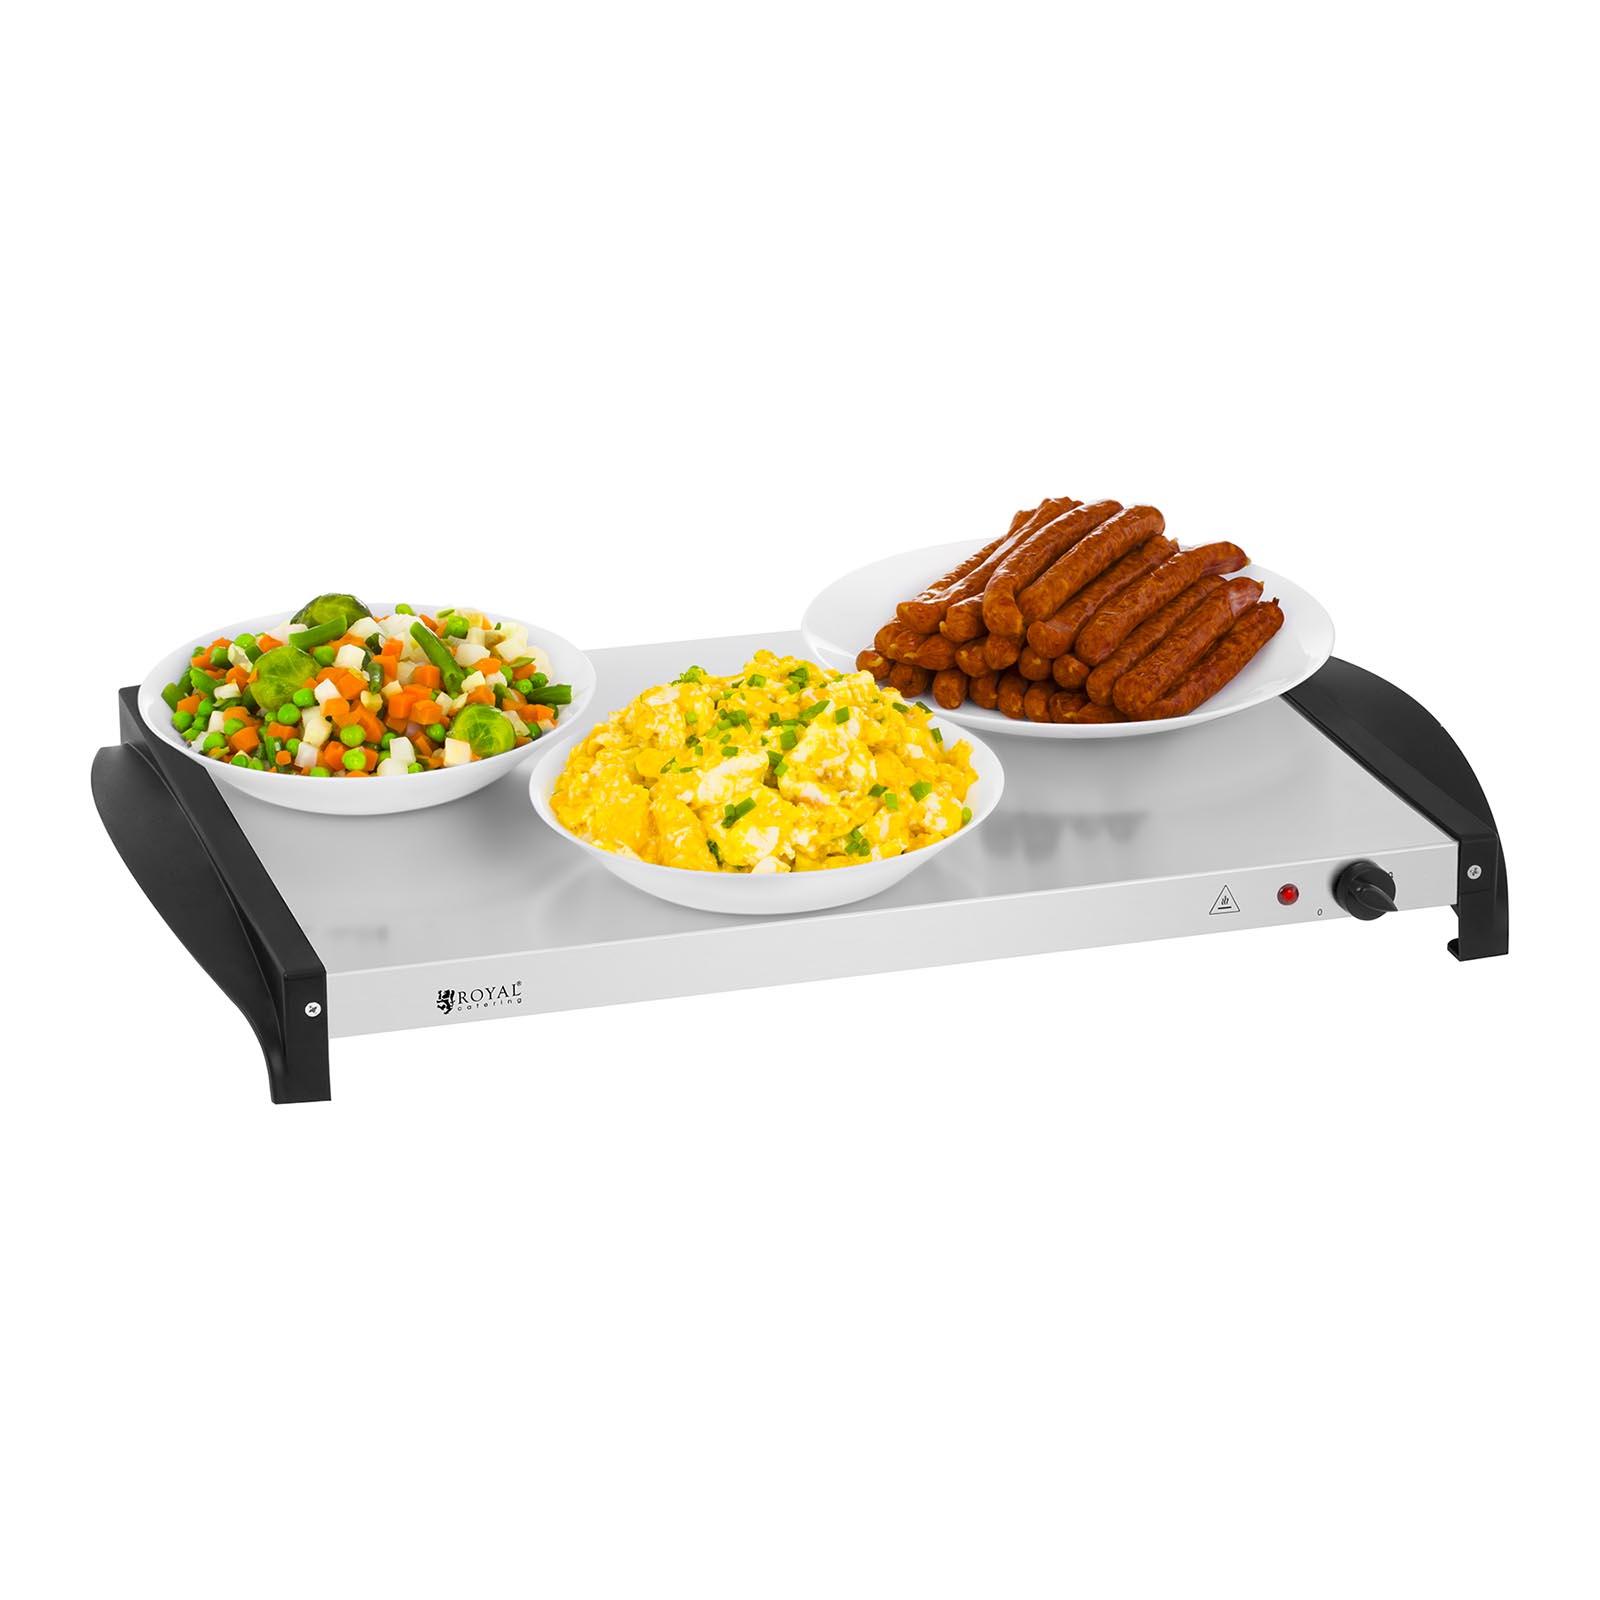 Royal Catering Chauffe-plat Pan Grand Buffet Aliments Plateau Inox 400W 3x2.5L